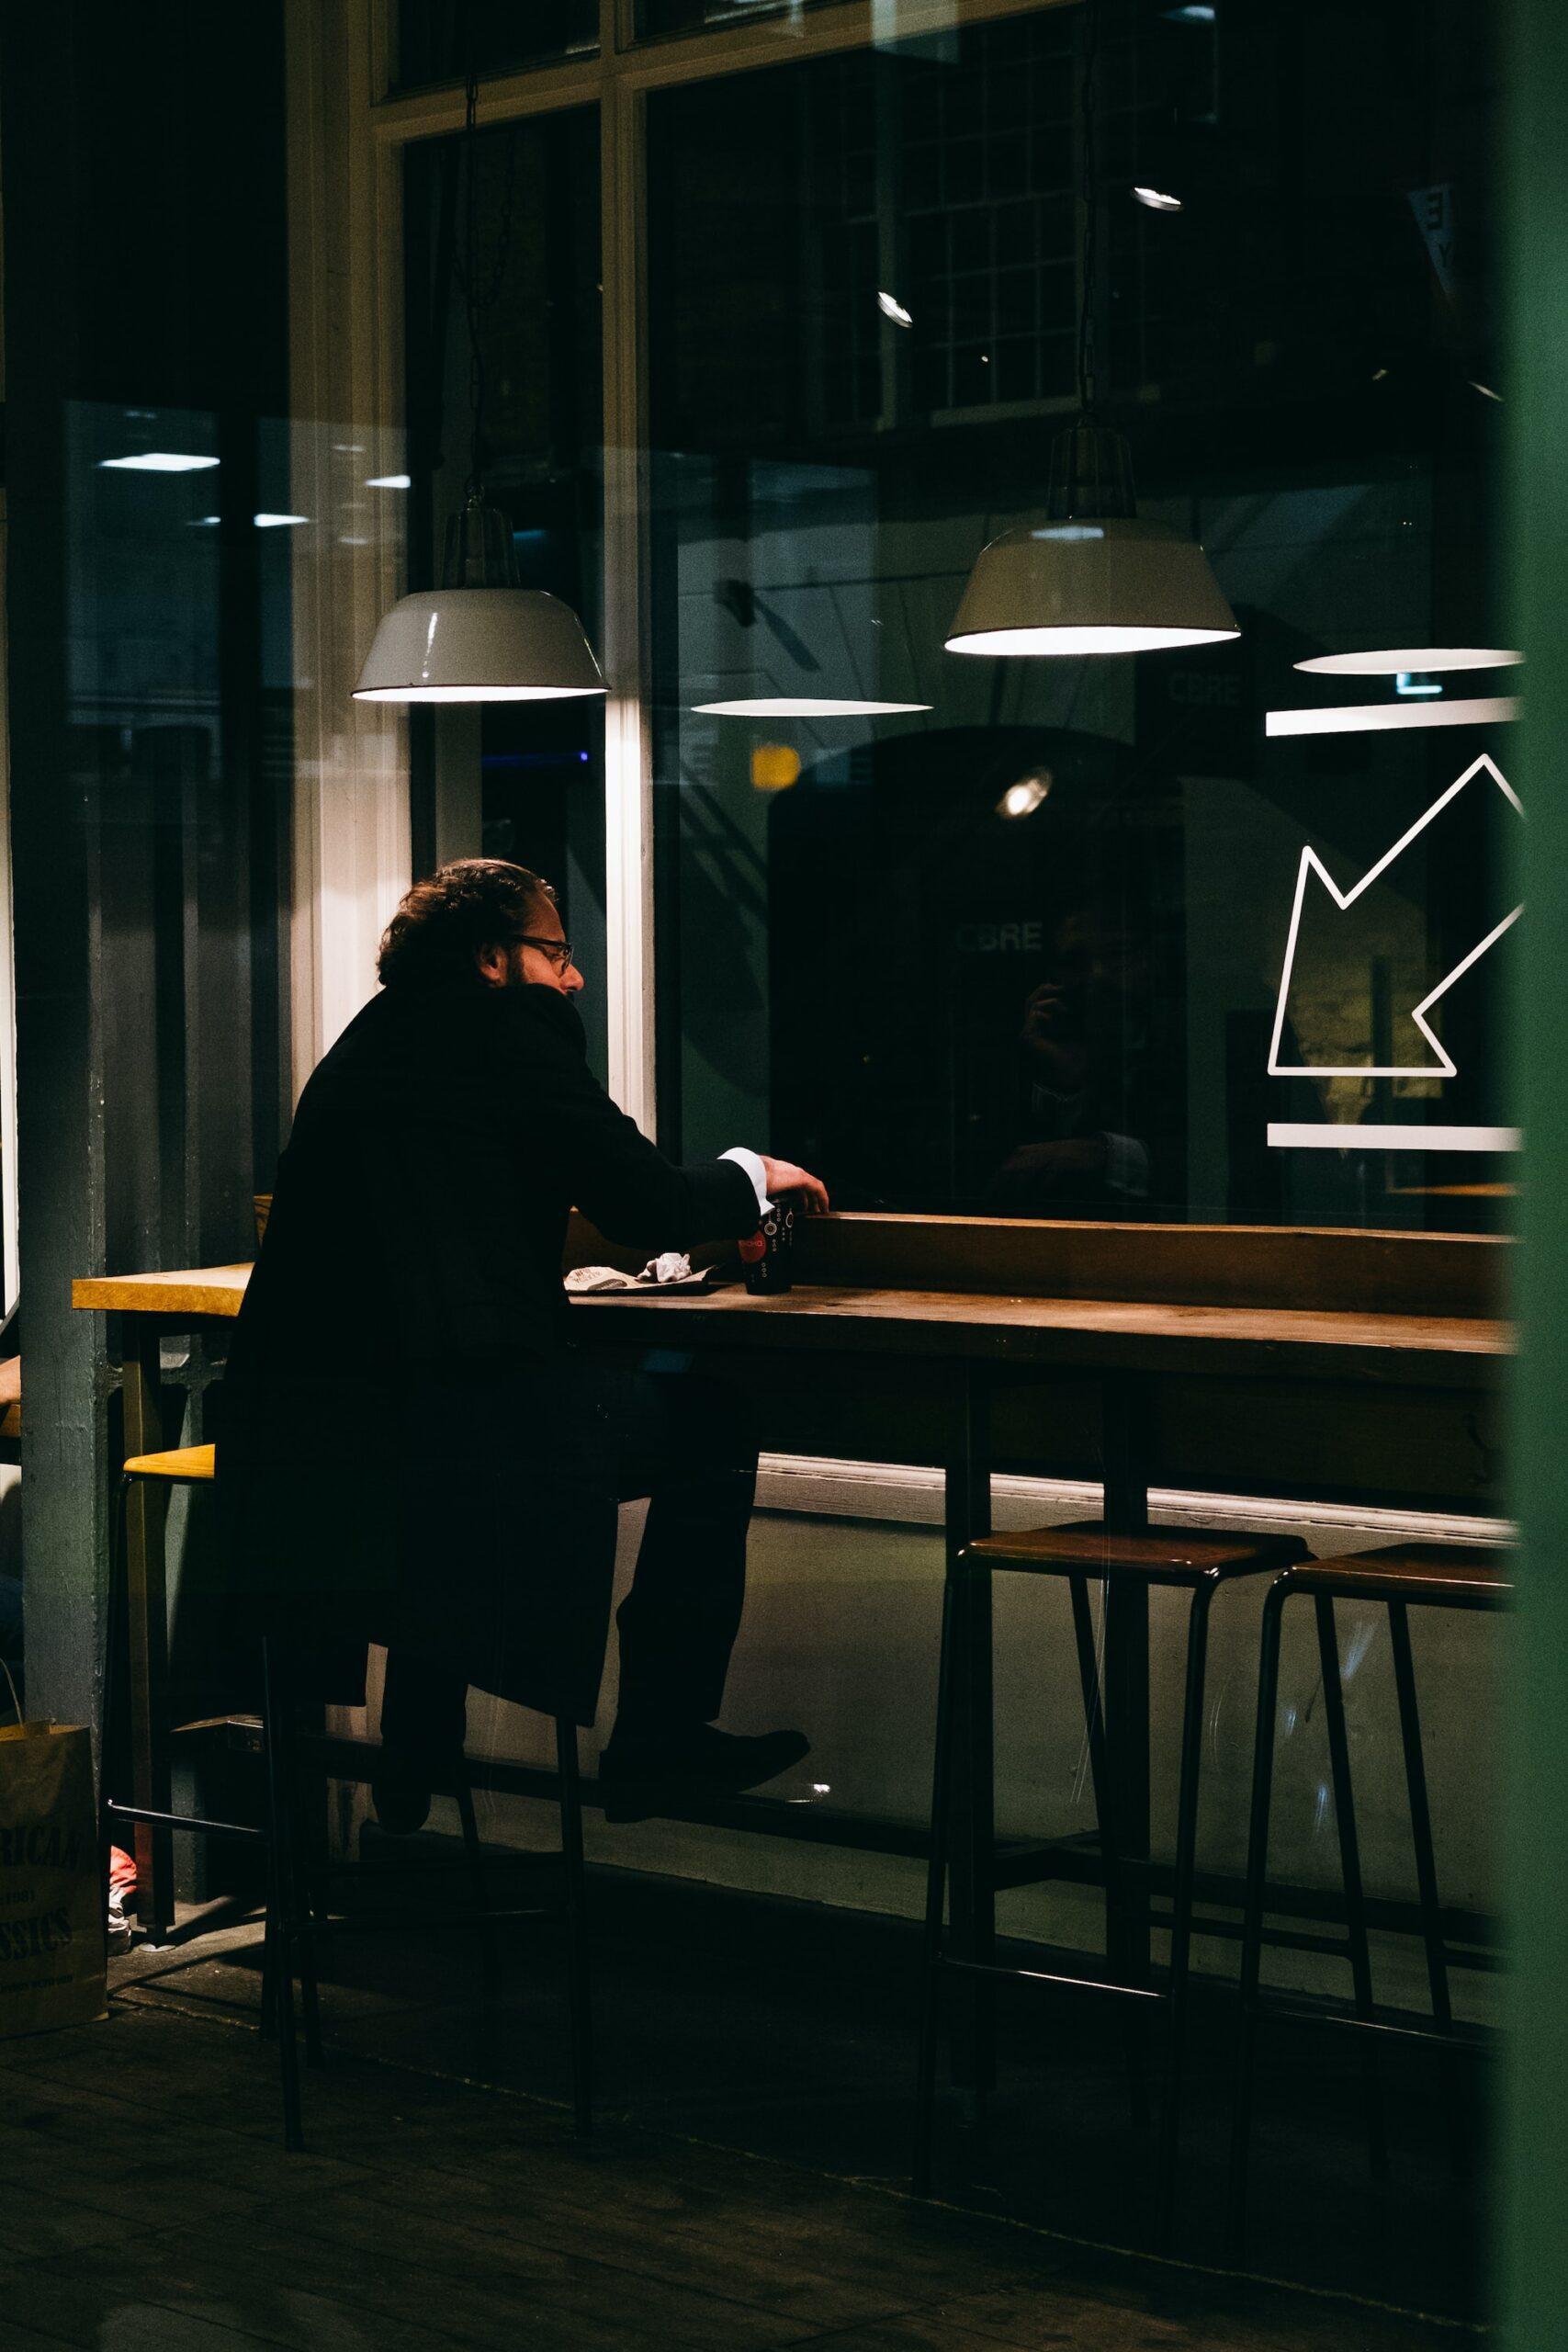 jay-clark-Man sitting in cafe late at night-unsplash